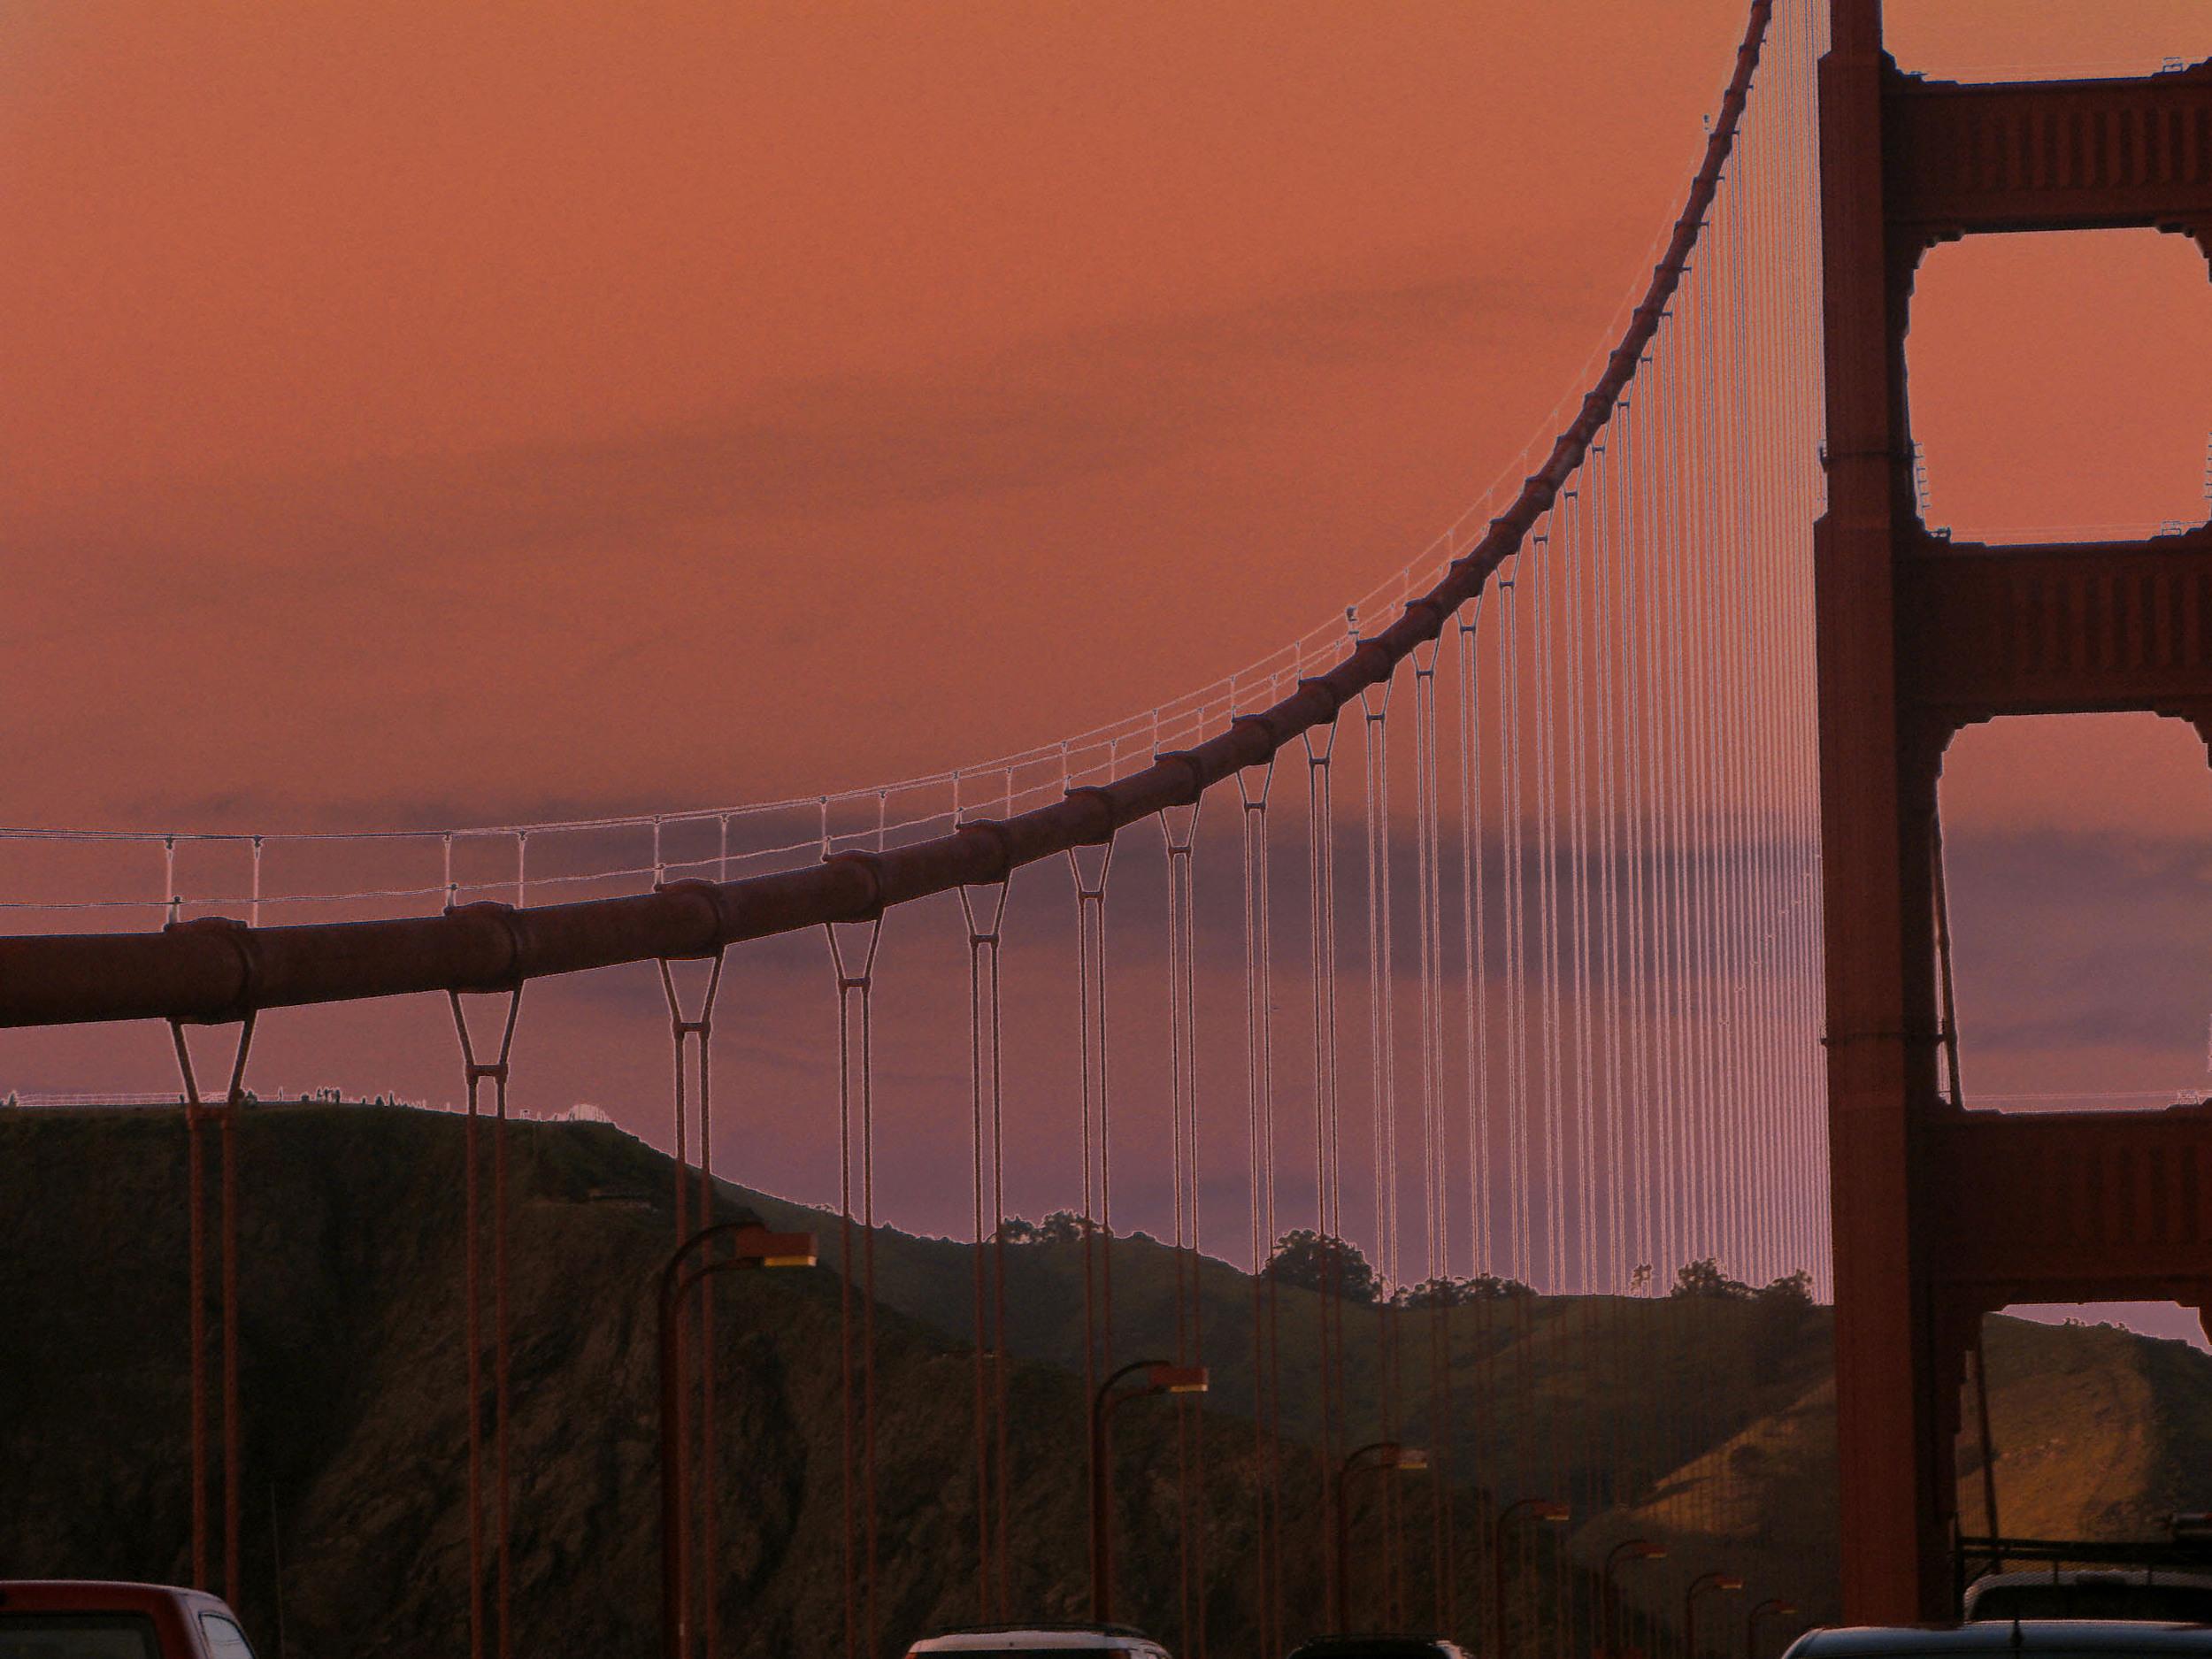 bridgecurve.jpg